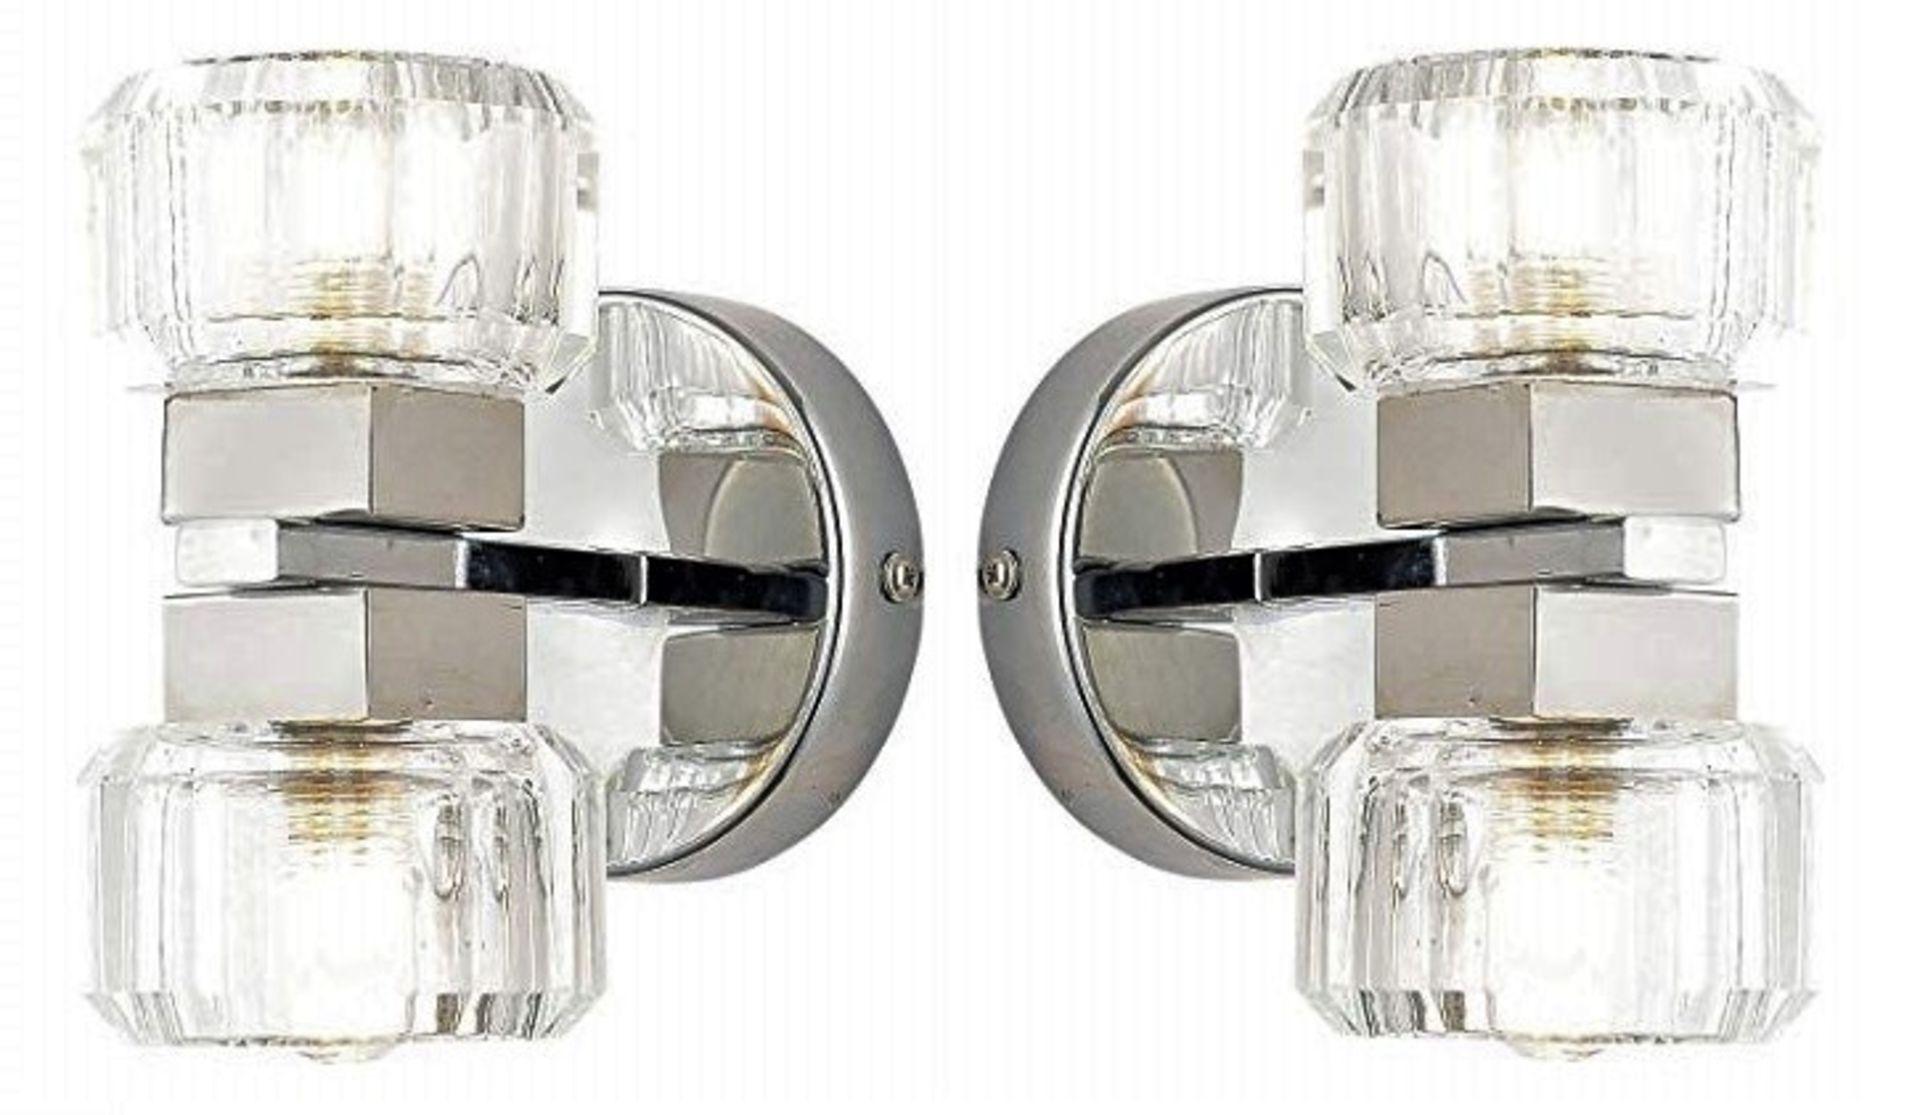 Lot 9162 - 2 x Spa Bathroom Lighting Octan Twin Light Wall Lights - Chrome With Glass Shades - Product Code